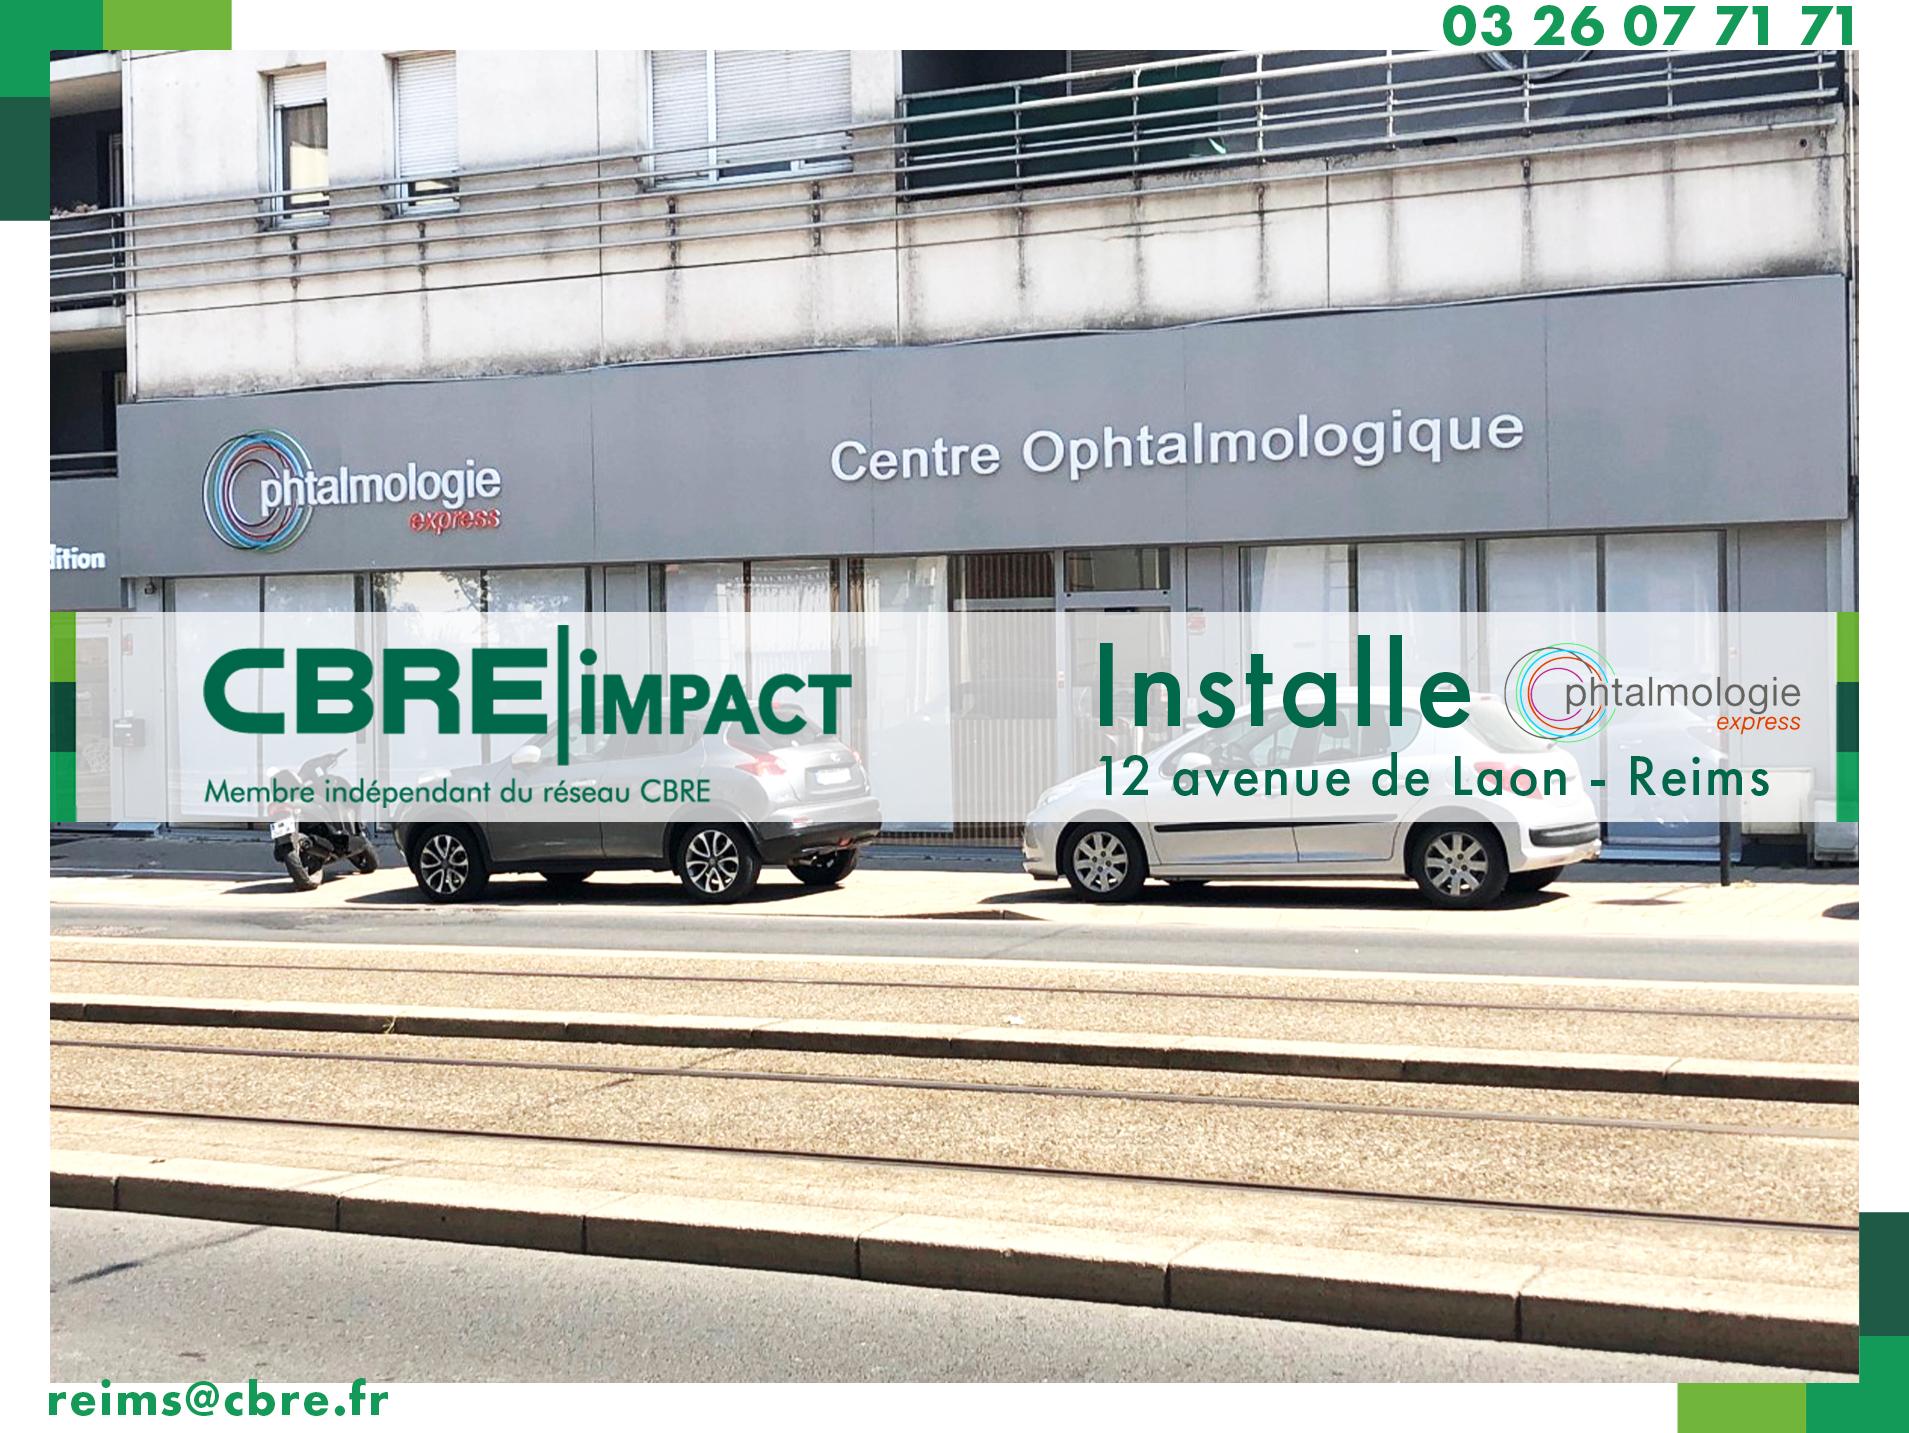 CBRE Impact Installe Ophtalmologie Express